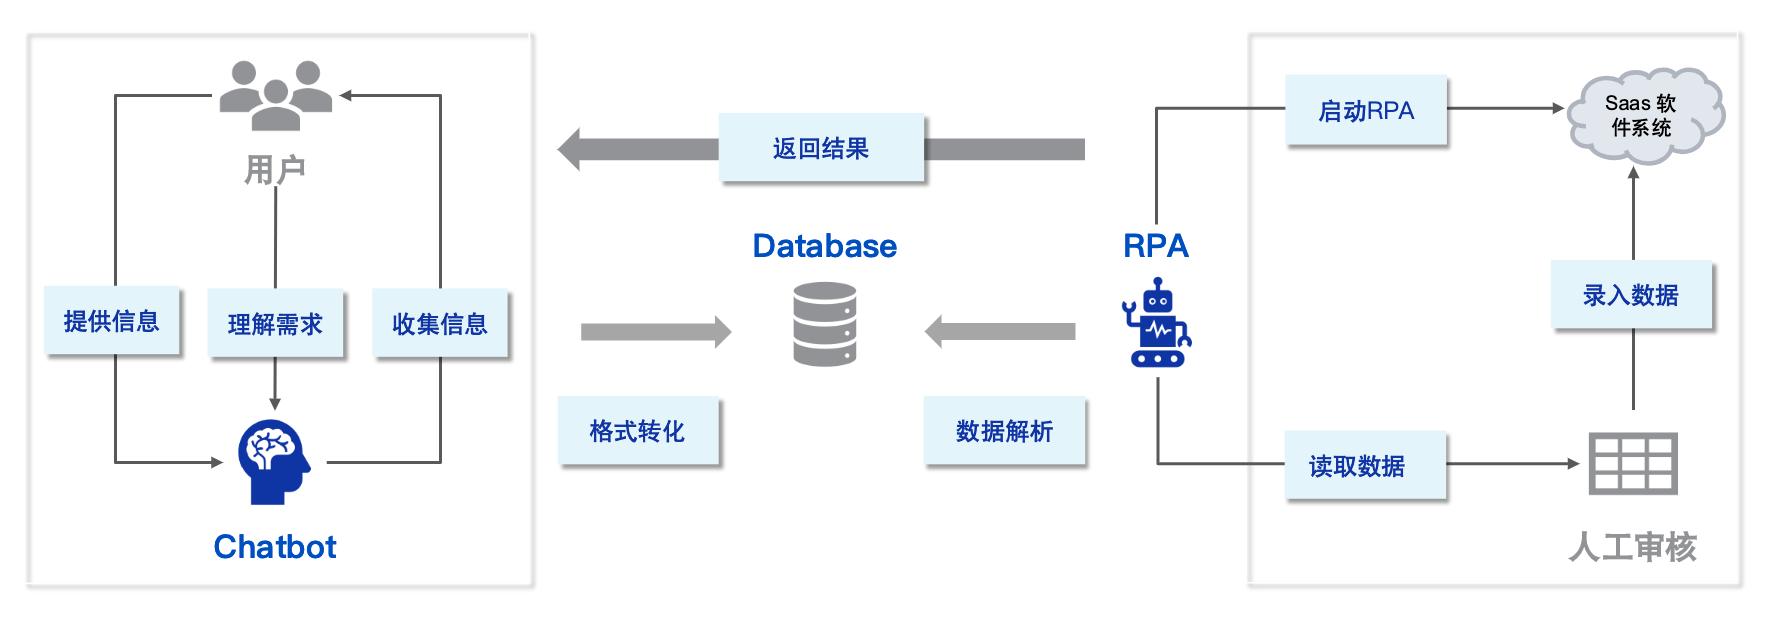 Chatbot+RPA是企业数字化与智能化发展的关键